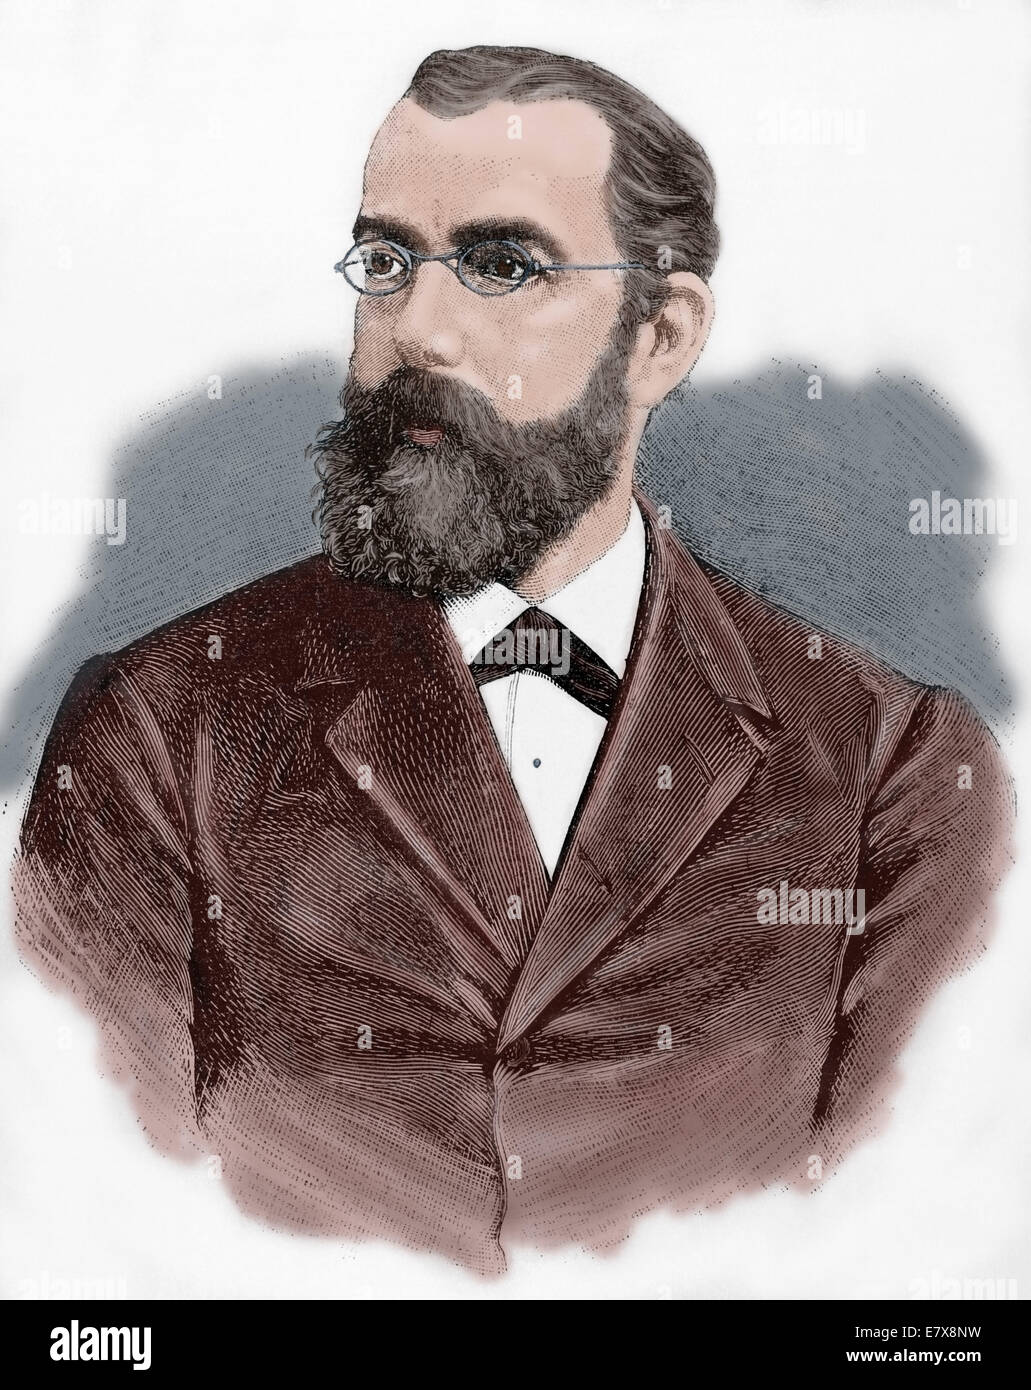 Hermann koch stockfotos hermann koch bilder alamy for Koch hermann